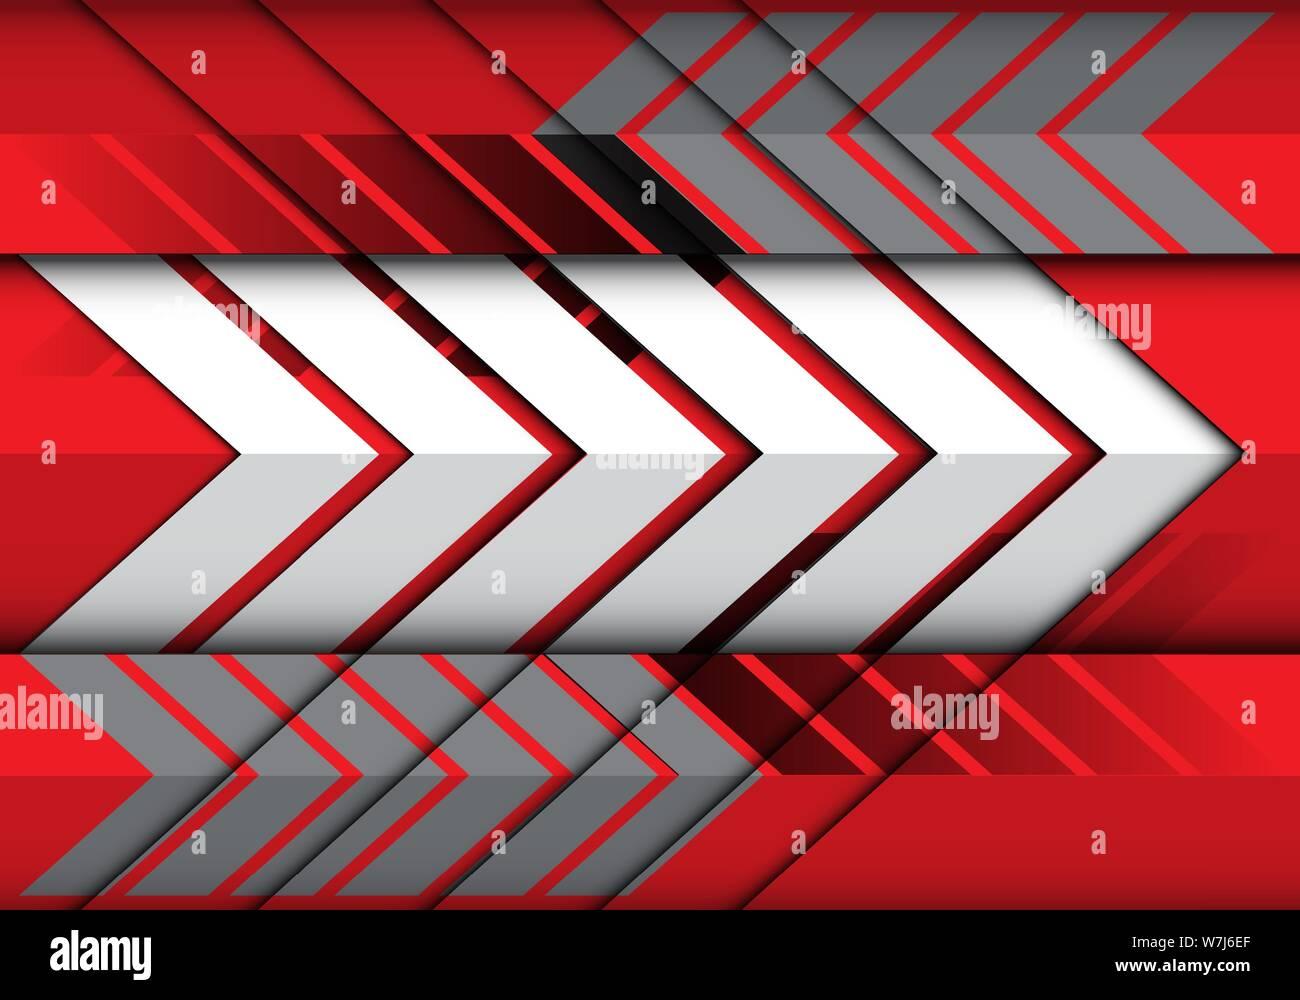 Get Red Background Design Hd Background